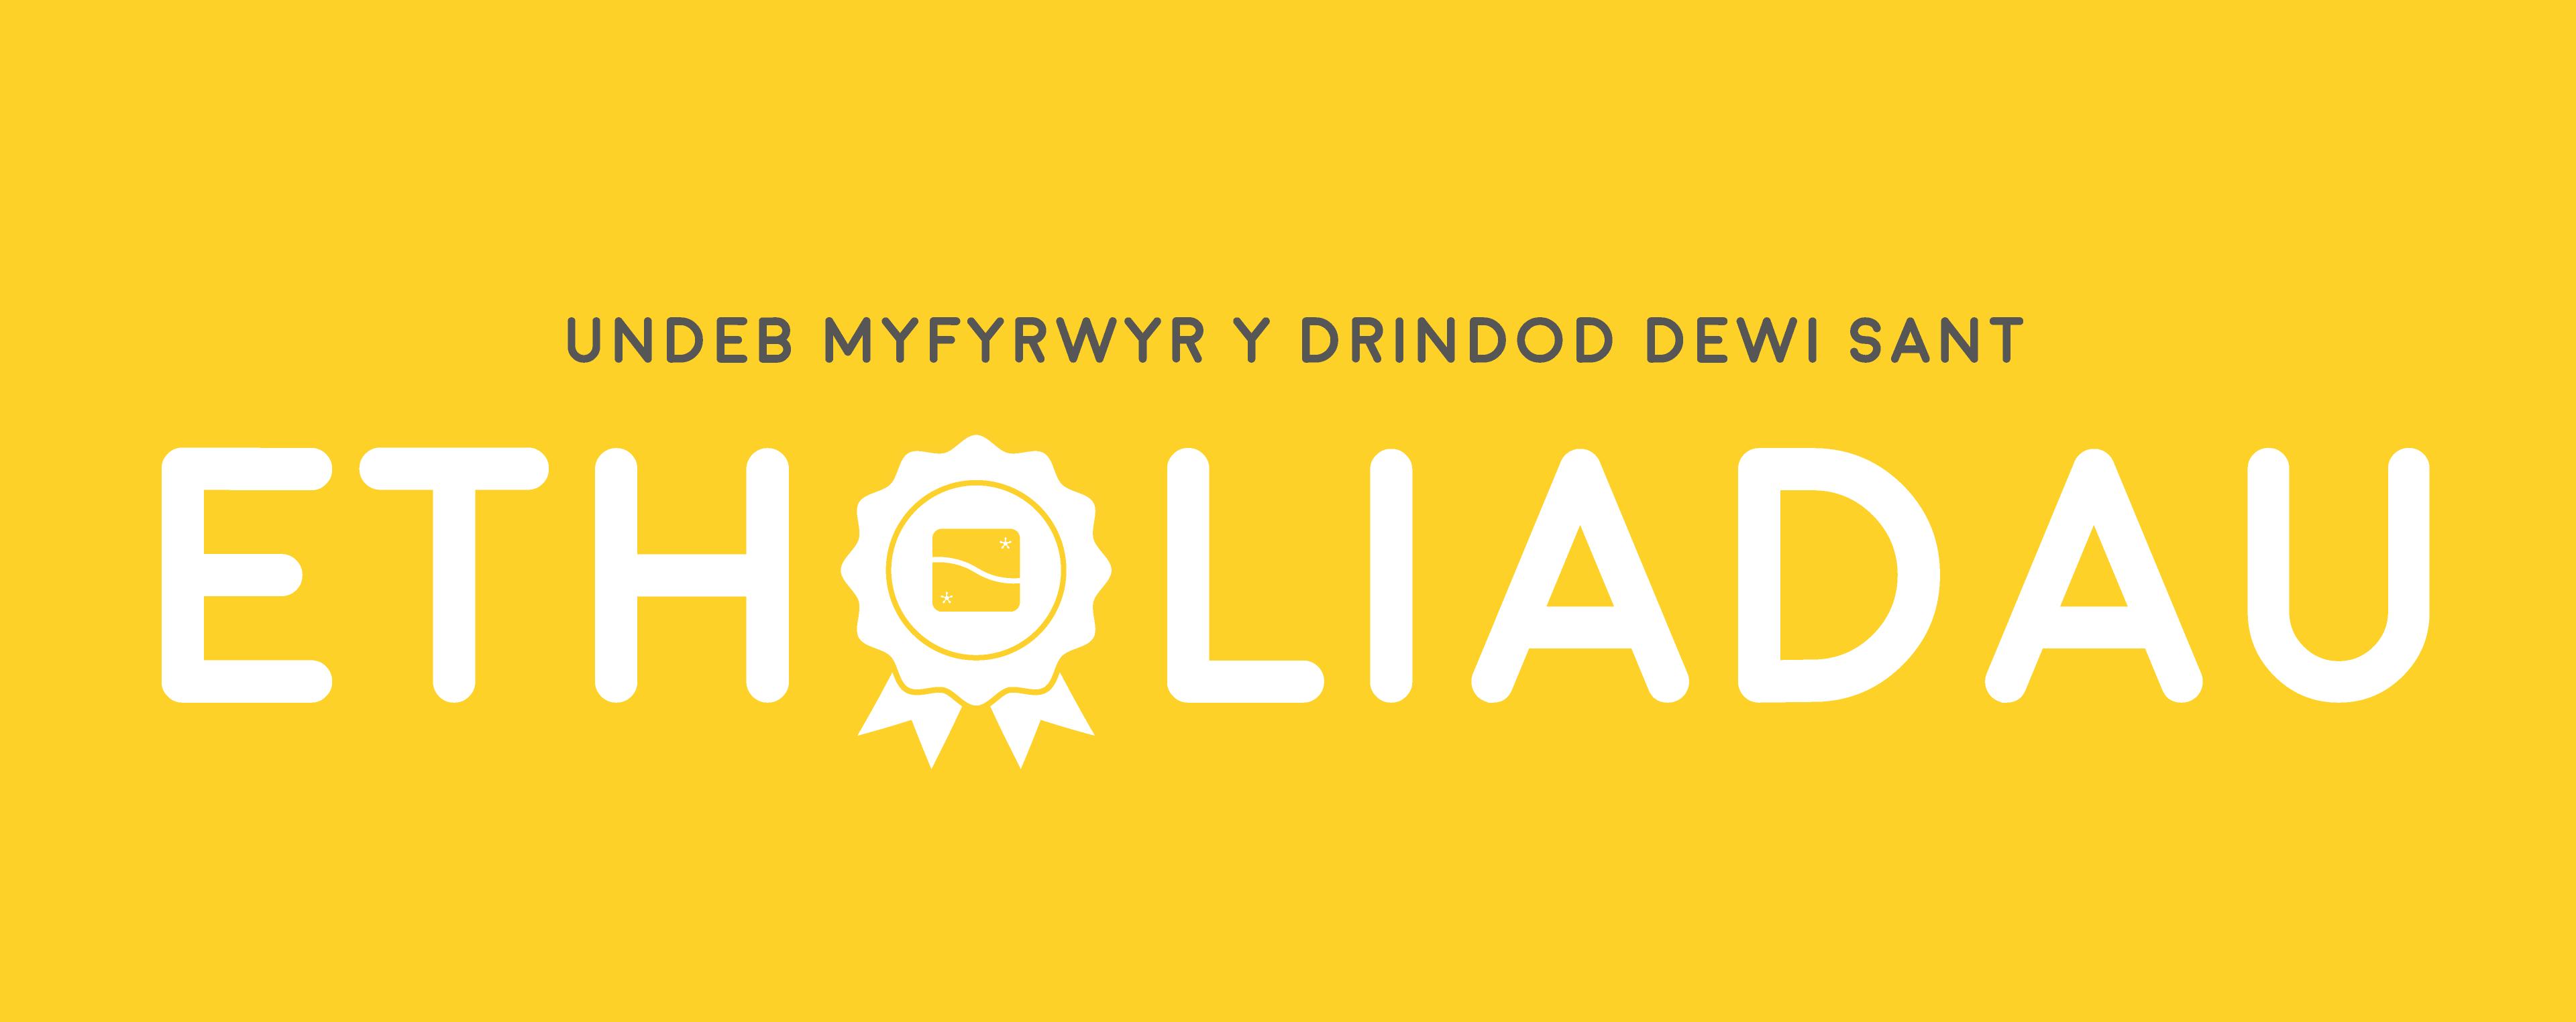 Welsh header